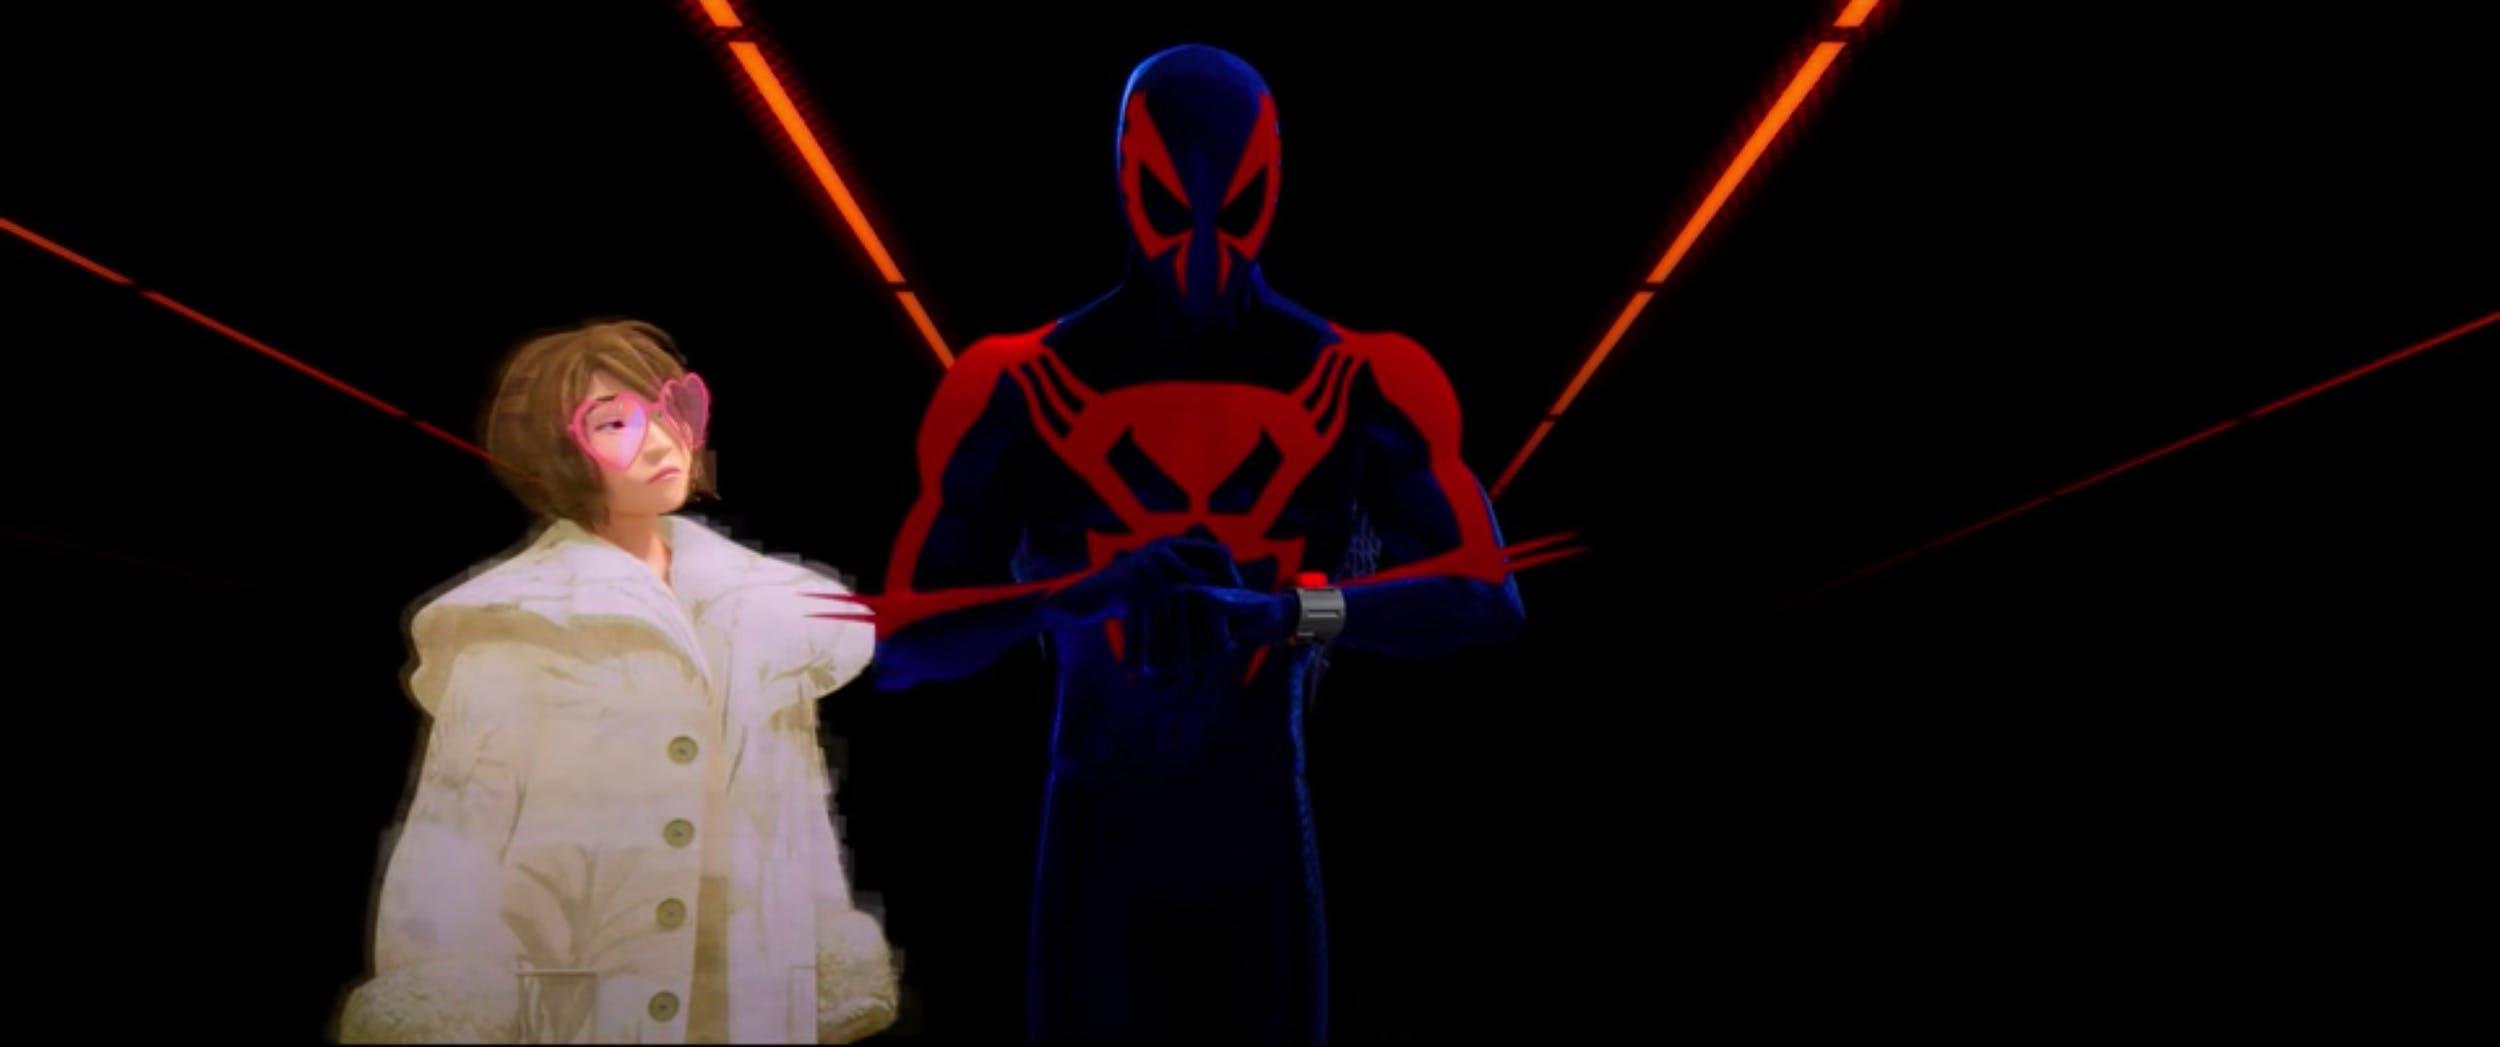 spider-verse lyla miguel